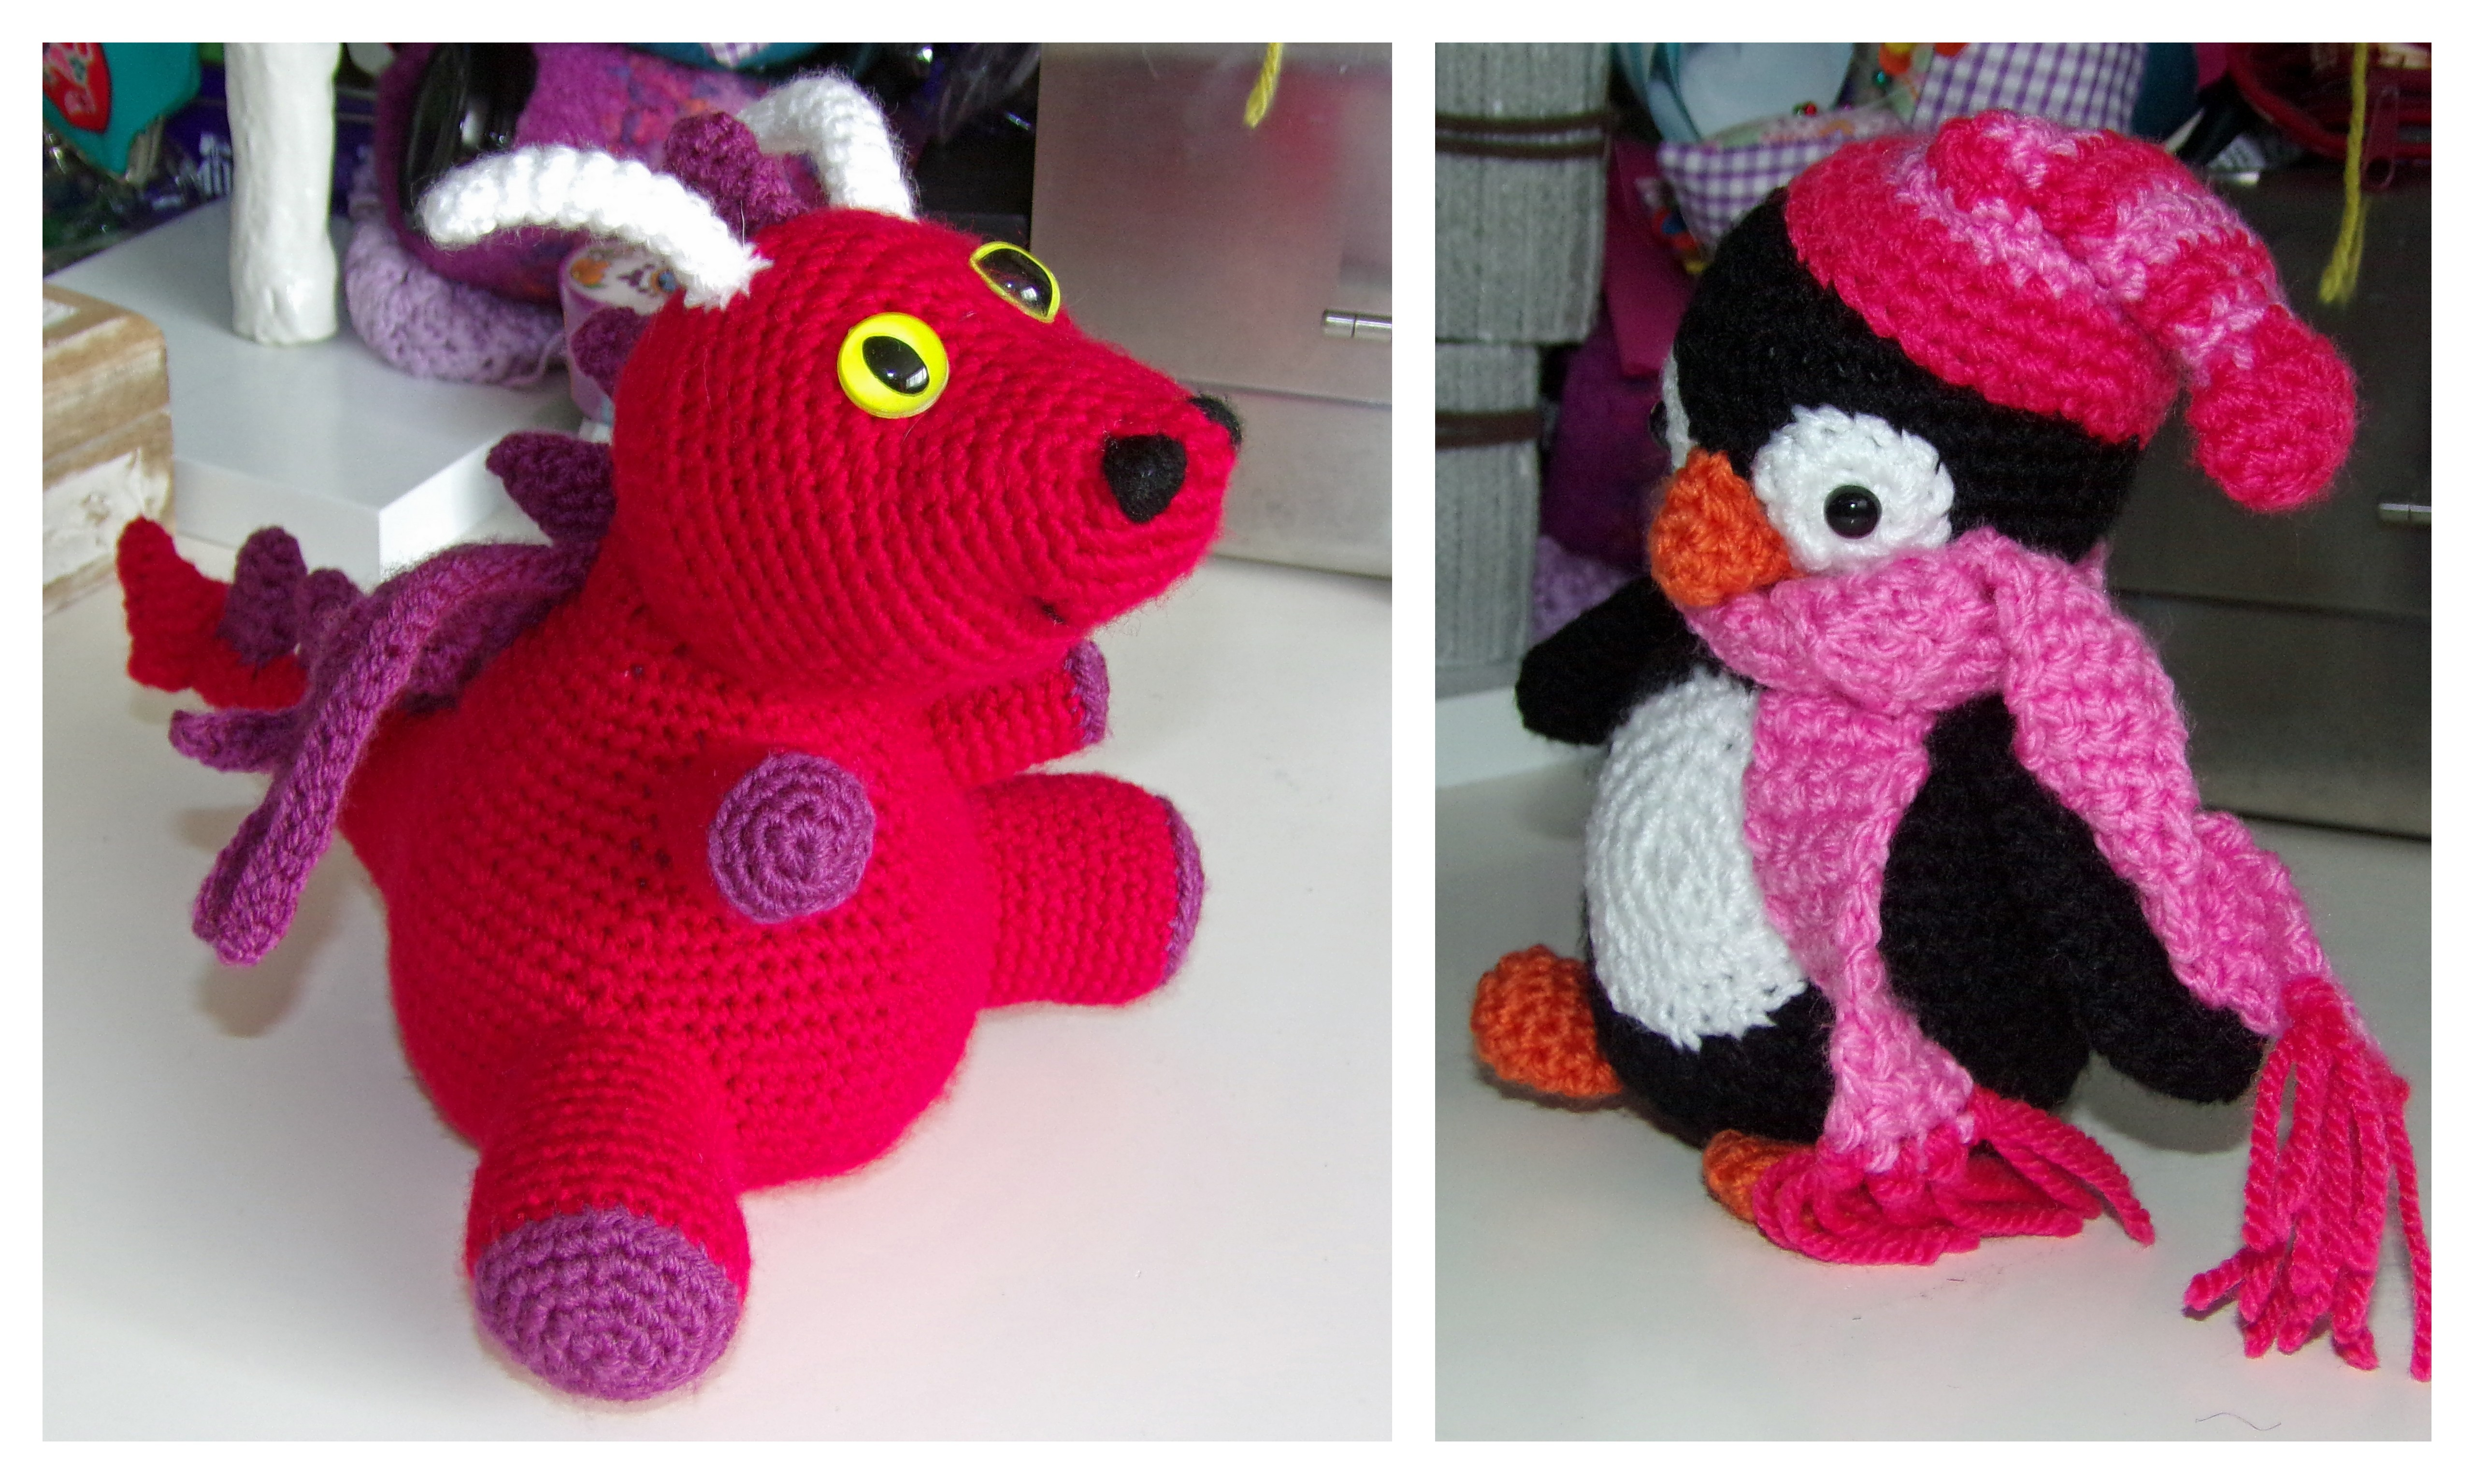 Crochet Amigurumi Dragon : More crocheted amigurumi presents for kids u the dragon and the